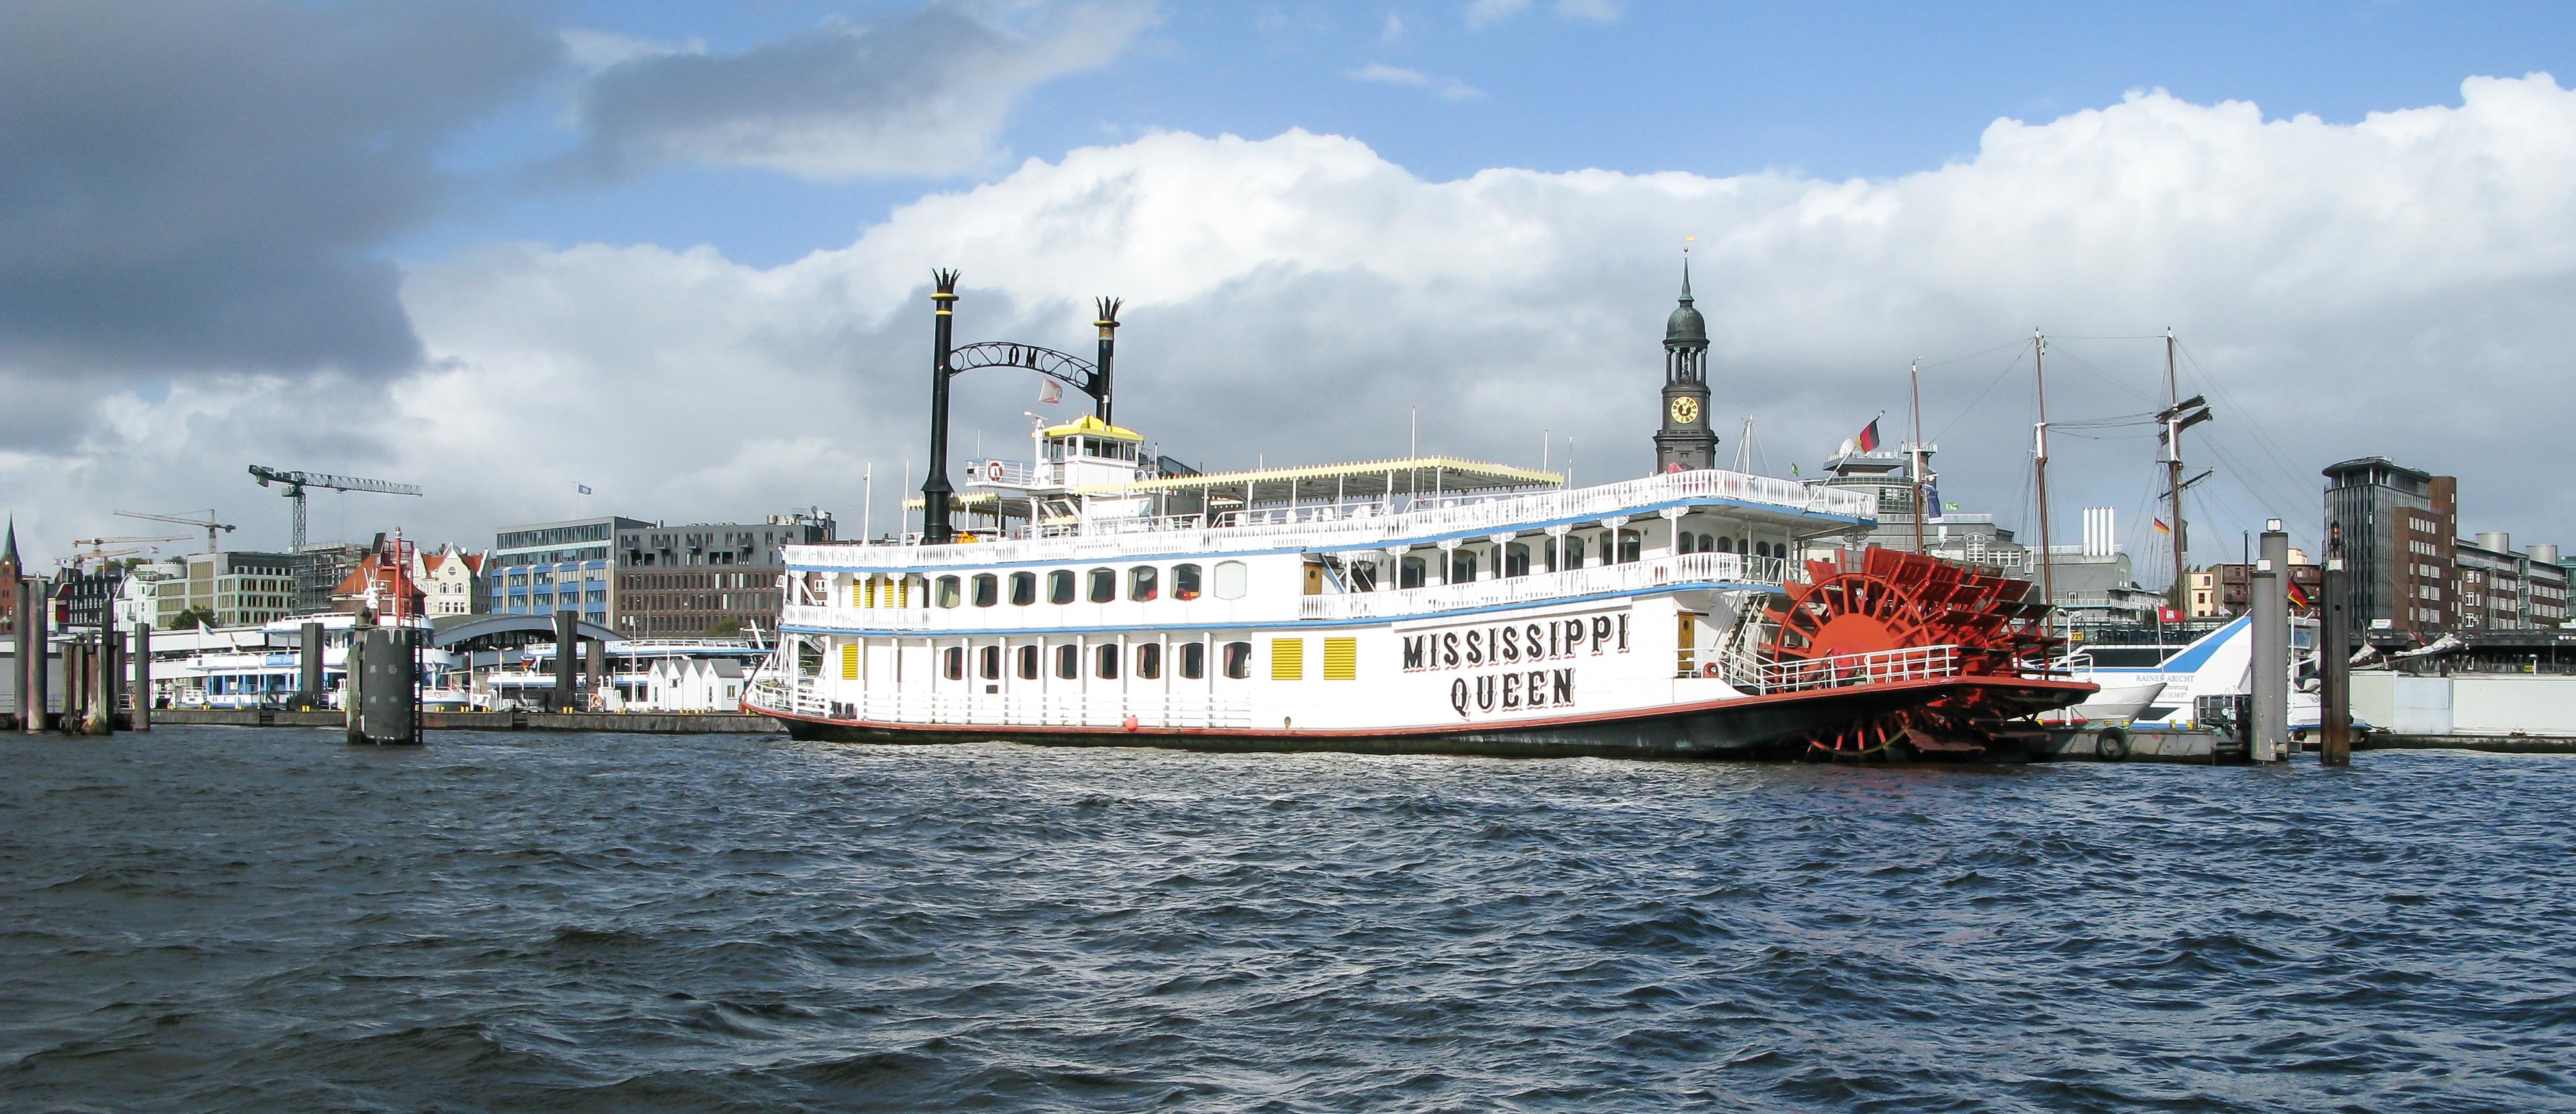 100 Free Online Dating in Hamburg NY